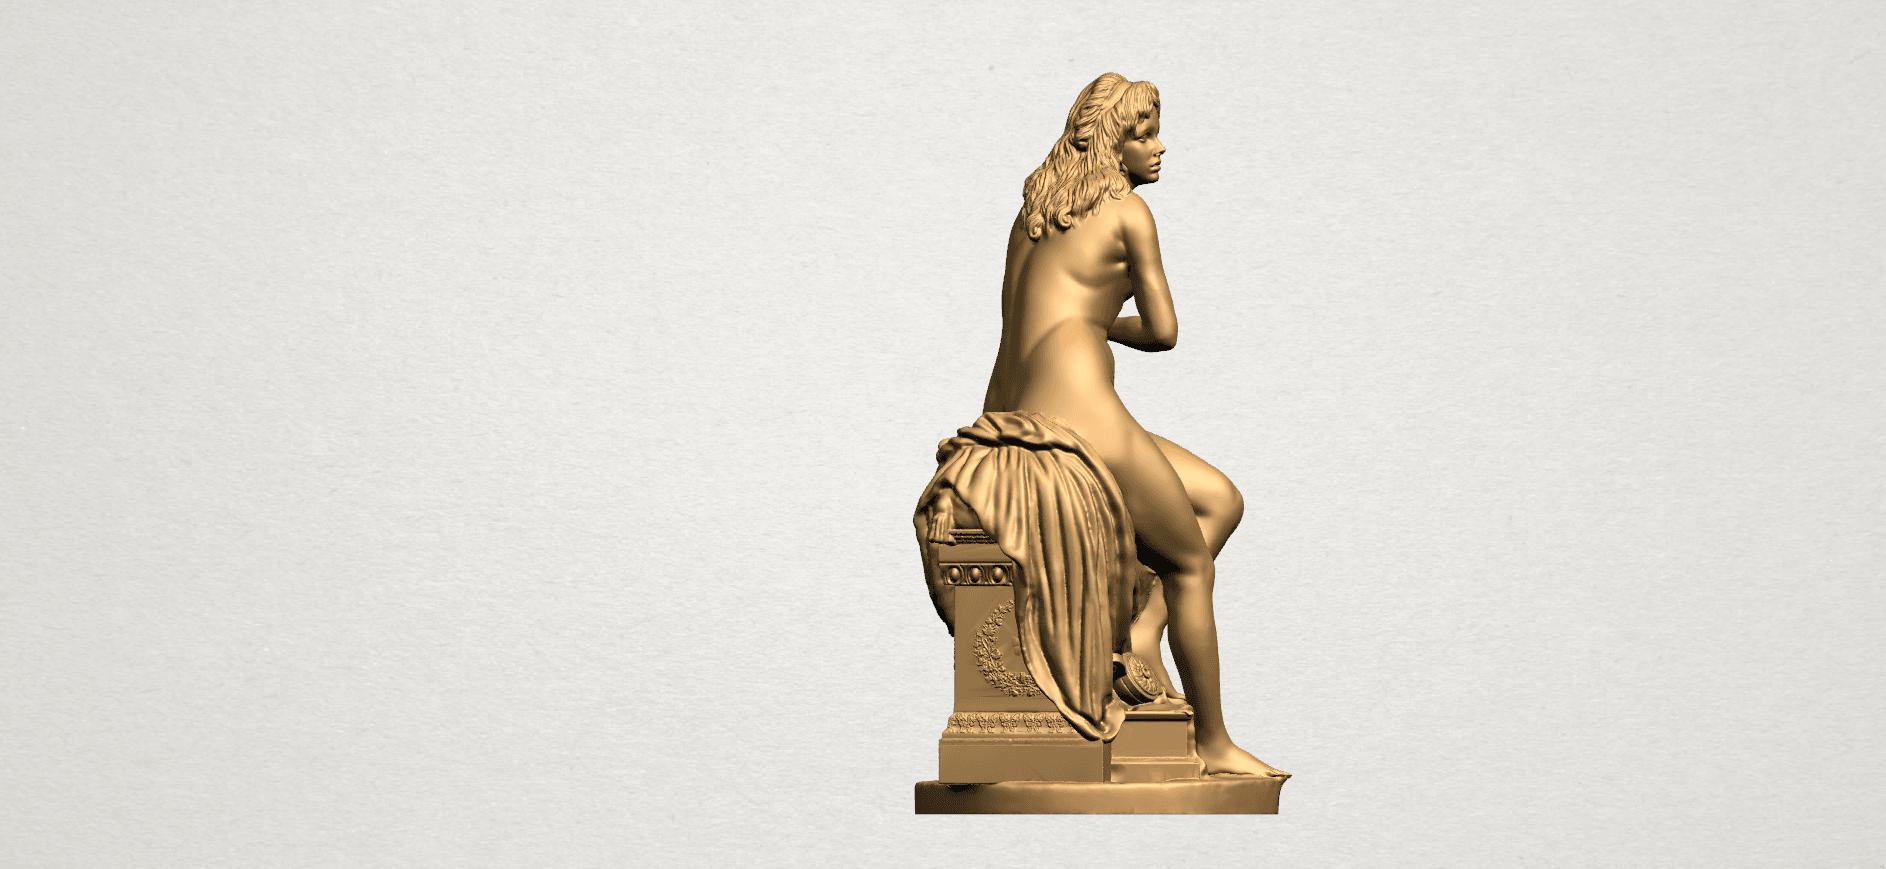 Naked Girl (i) B07.png Download free STL file Naked Girl 01 • 3D printing model, GeorgesNikkei